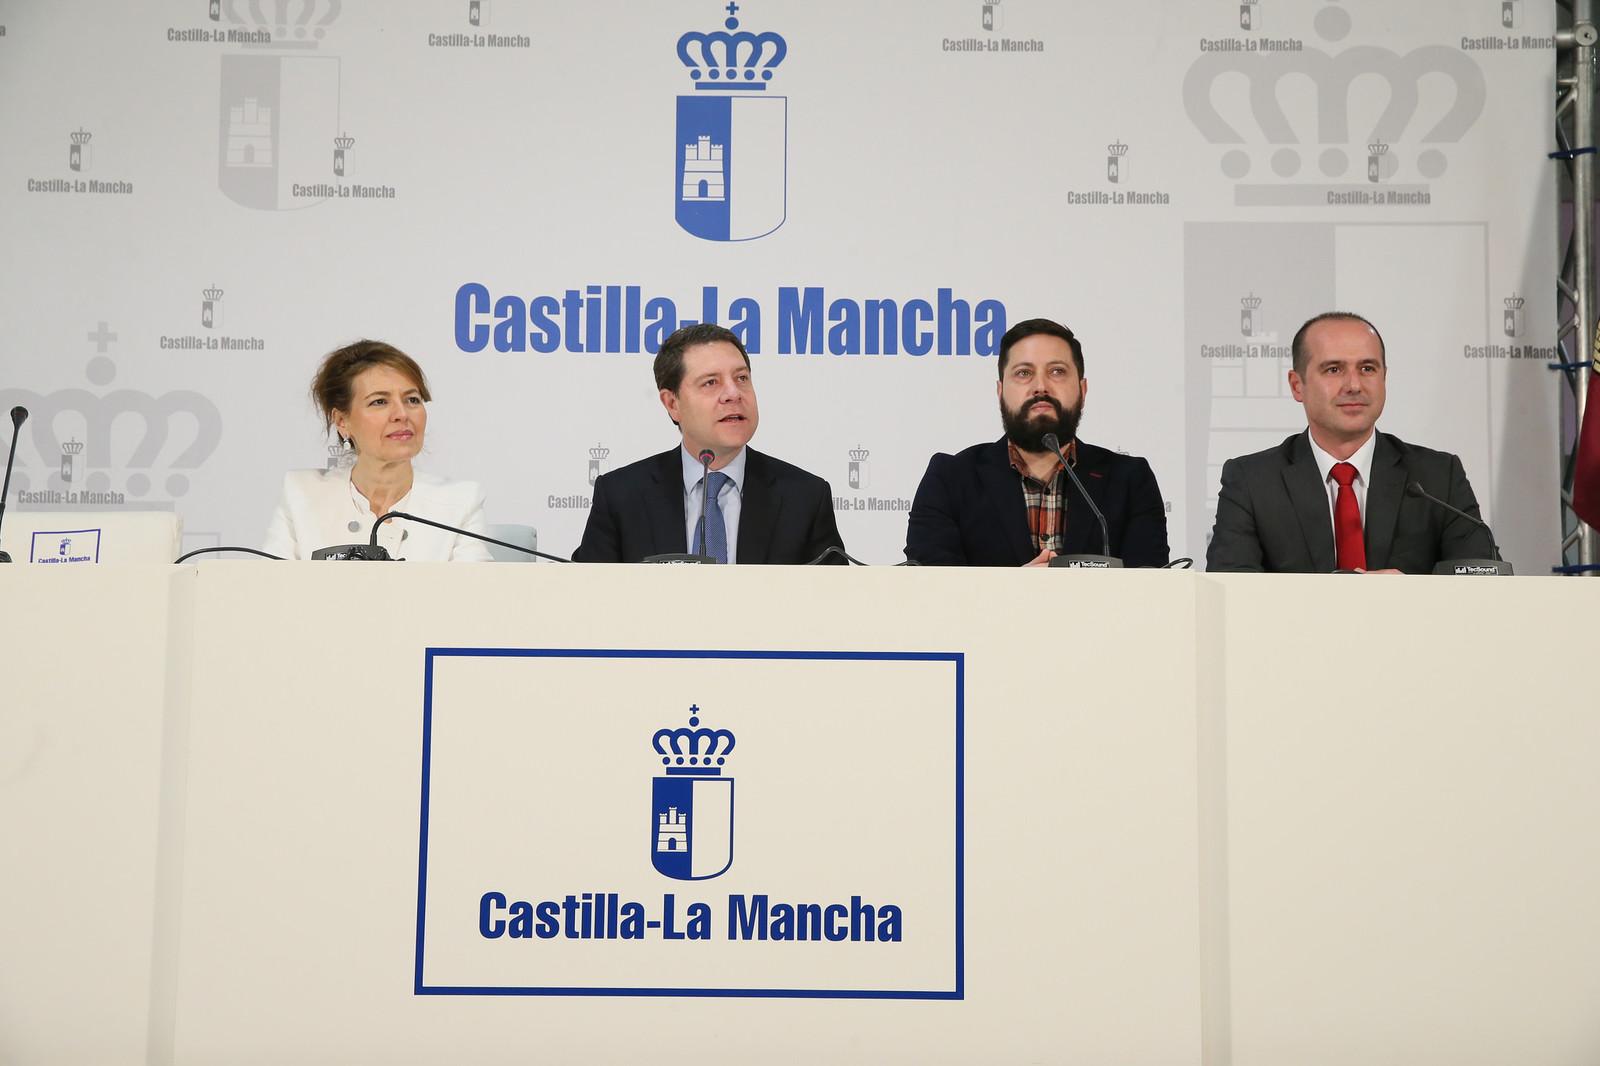 Castilla la mancha a la cabeza en plazas residenciales for Canal castilla la mancha